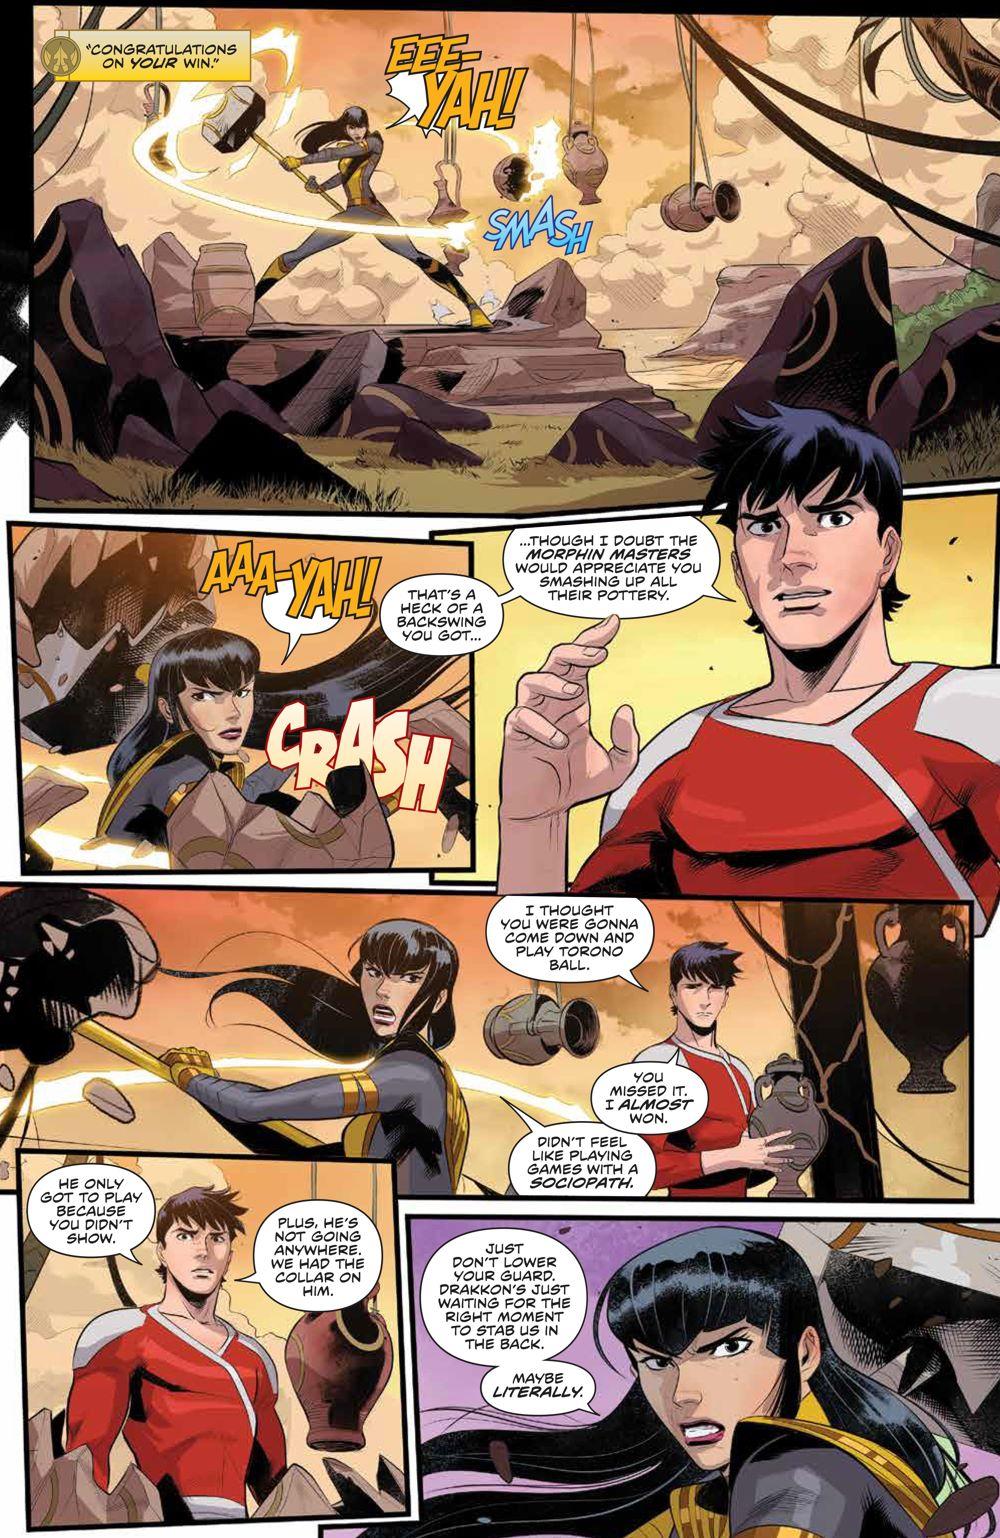 PowerRangers_007_PRESS_7 ComicList Previews: POWER RANGERS #7